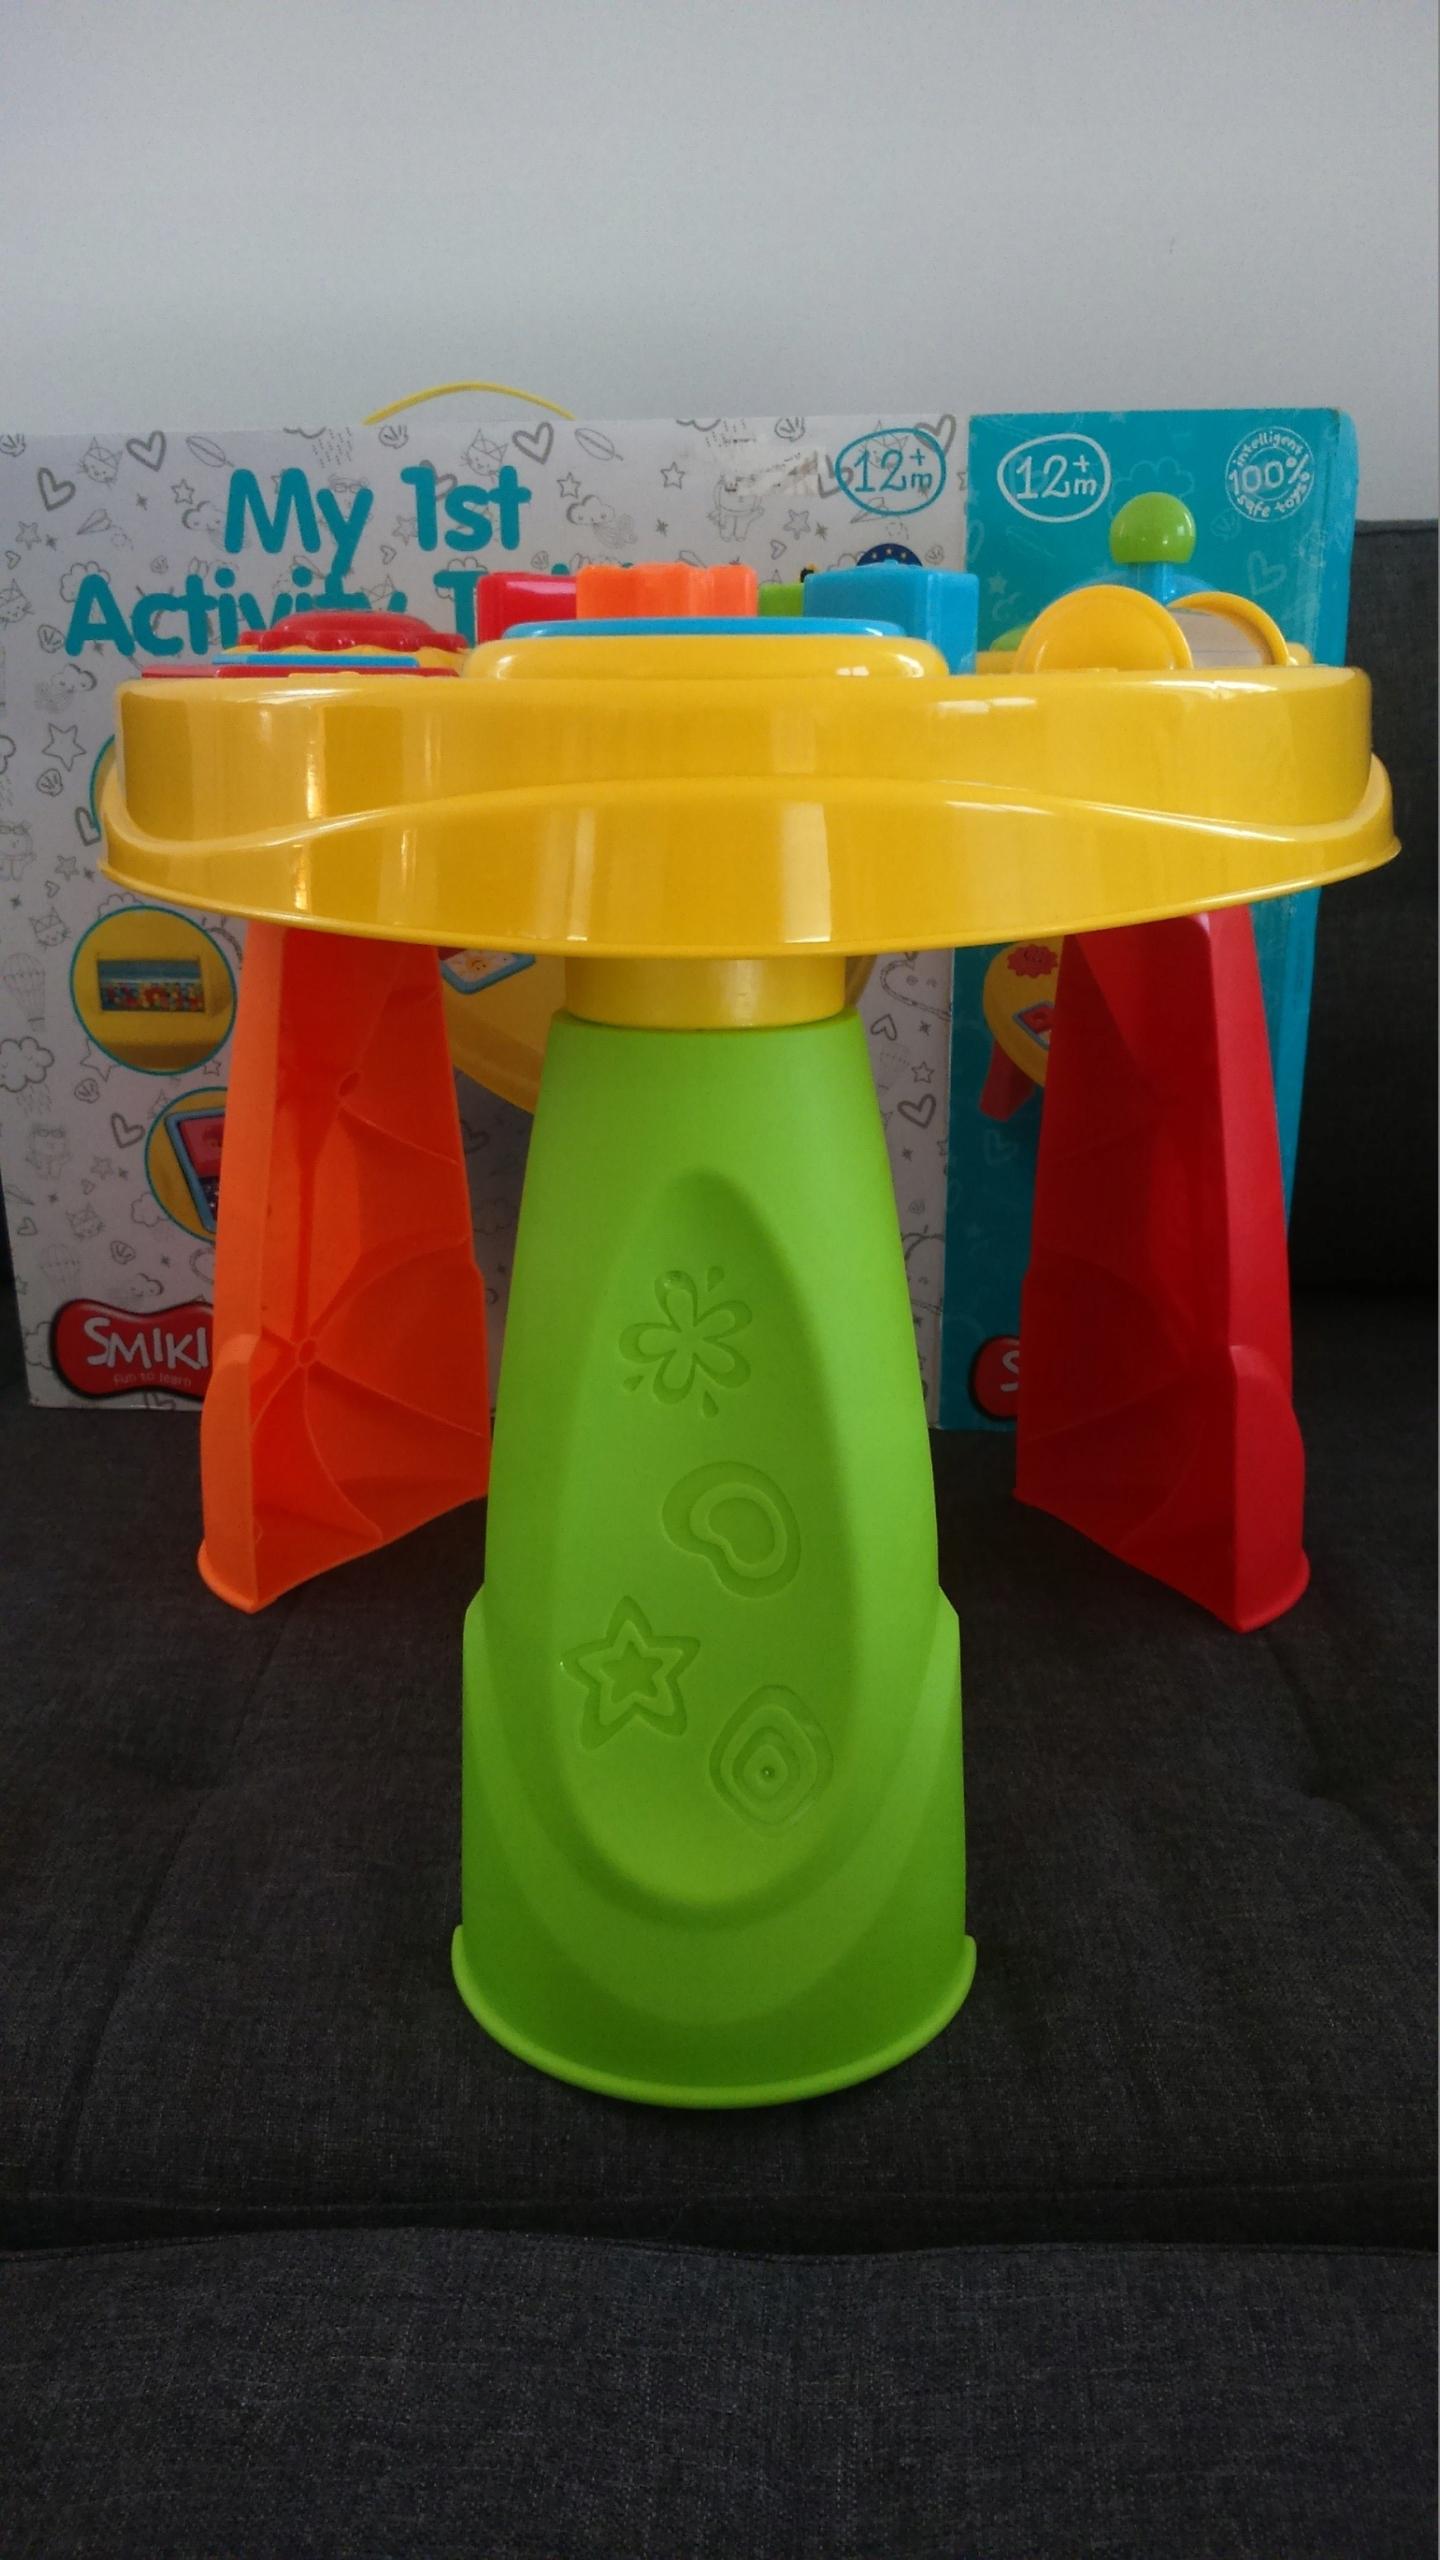 Smiki Smyk Stolik Edukacyjny My 1st Activity Table